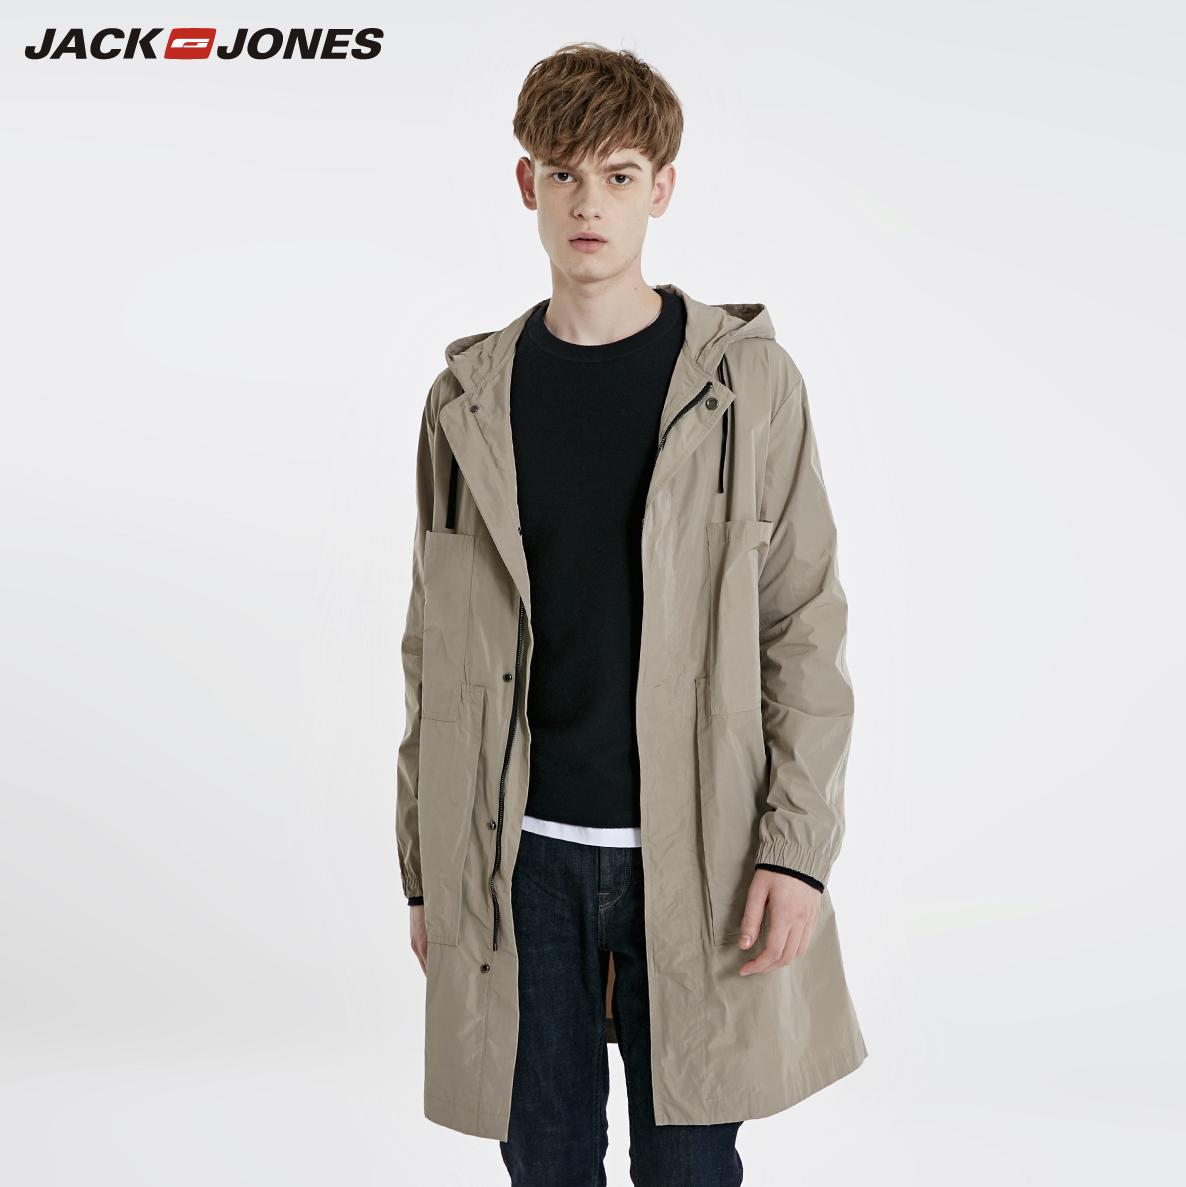 JACK JONES 杰克琼斯 219121501 男士连帽风衣